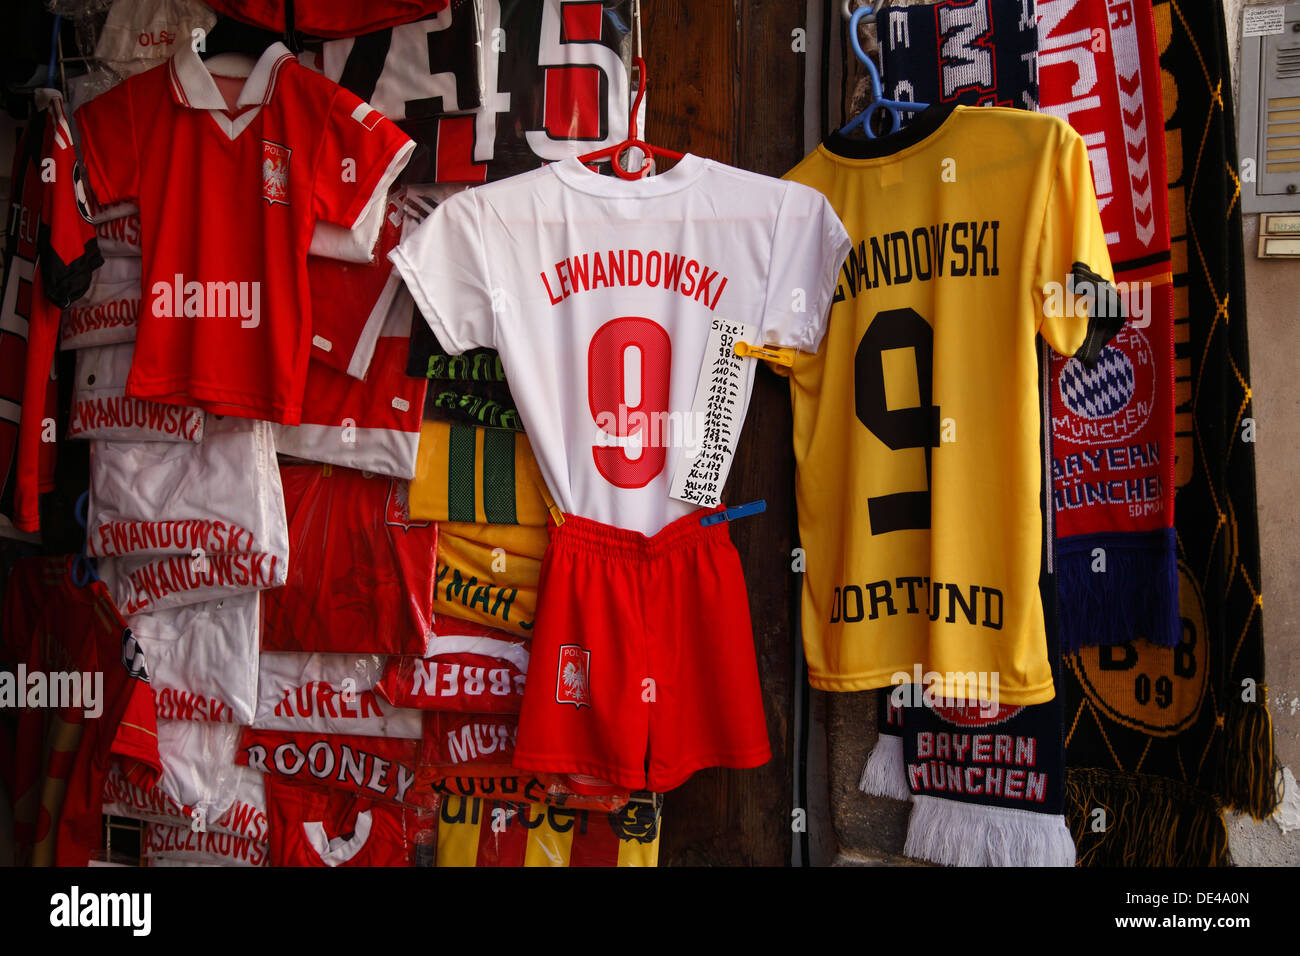 Souvenirshop with Lewandowski Football shirts, Krakow, Poland - Stock Image